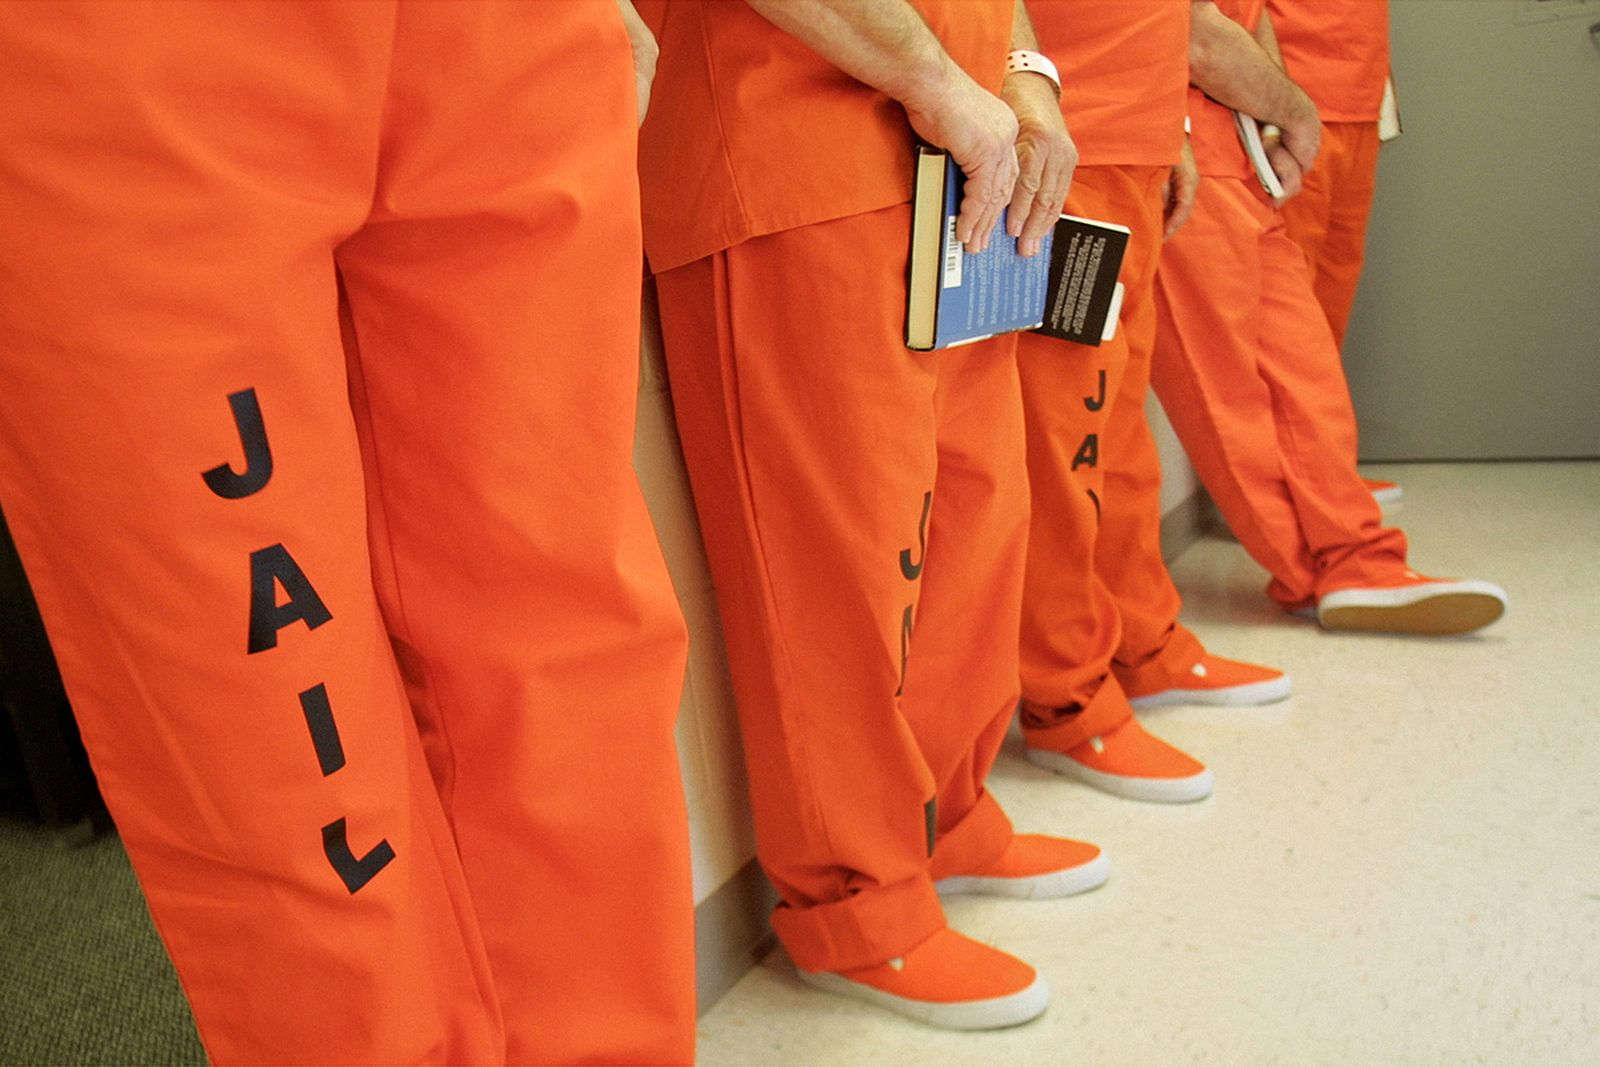 americas-need-prison-reform-long-overdue-main